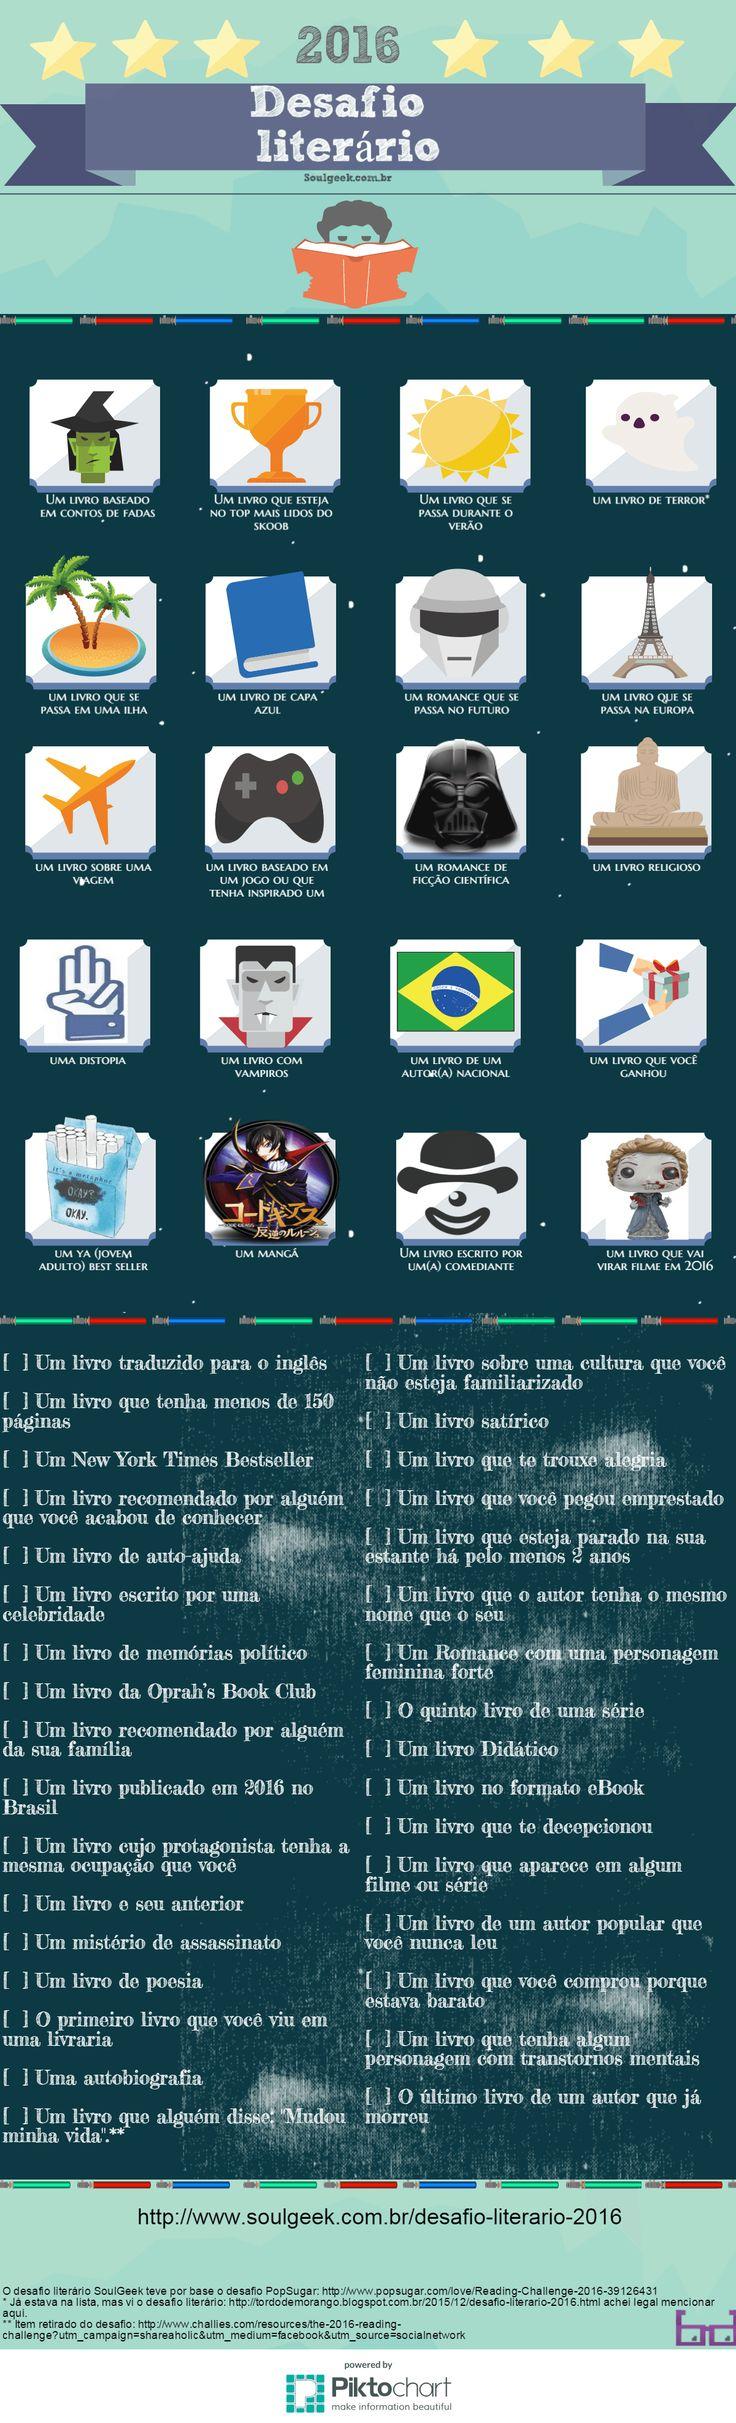 Desafio Literario 2016 SoulGeek